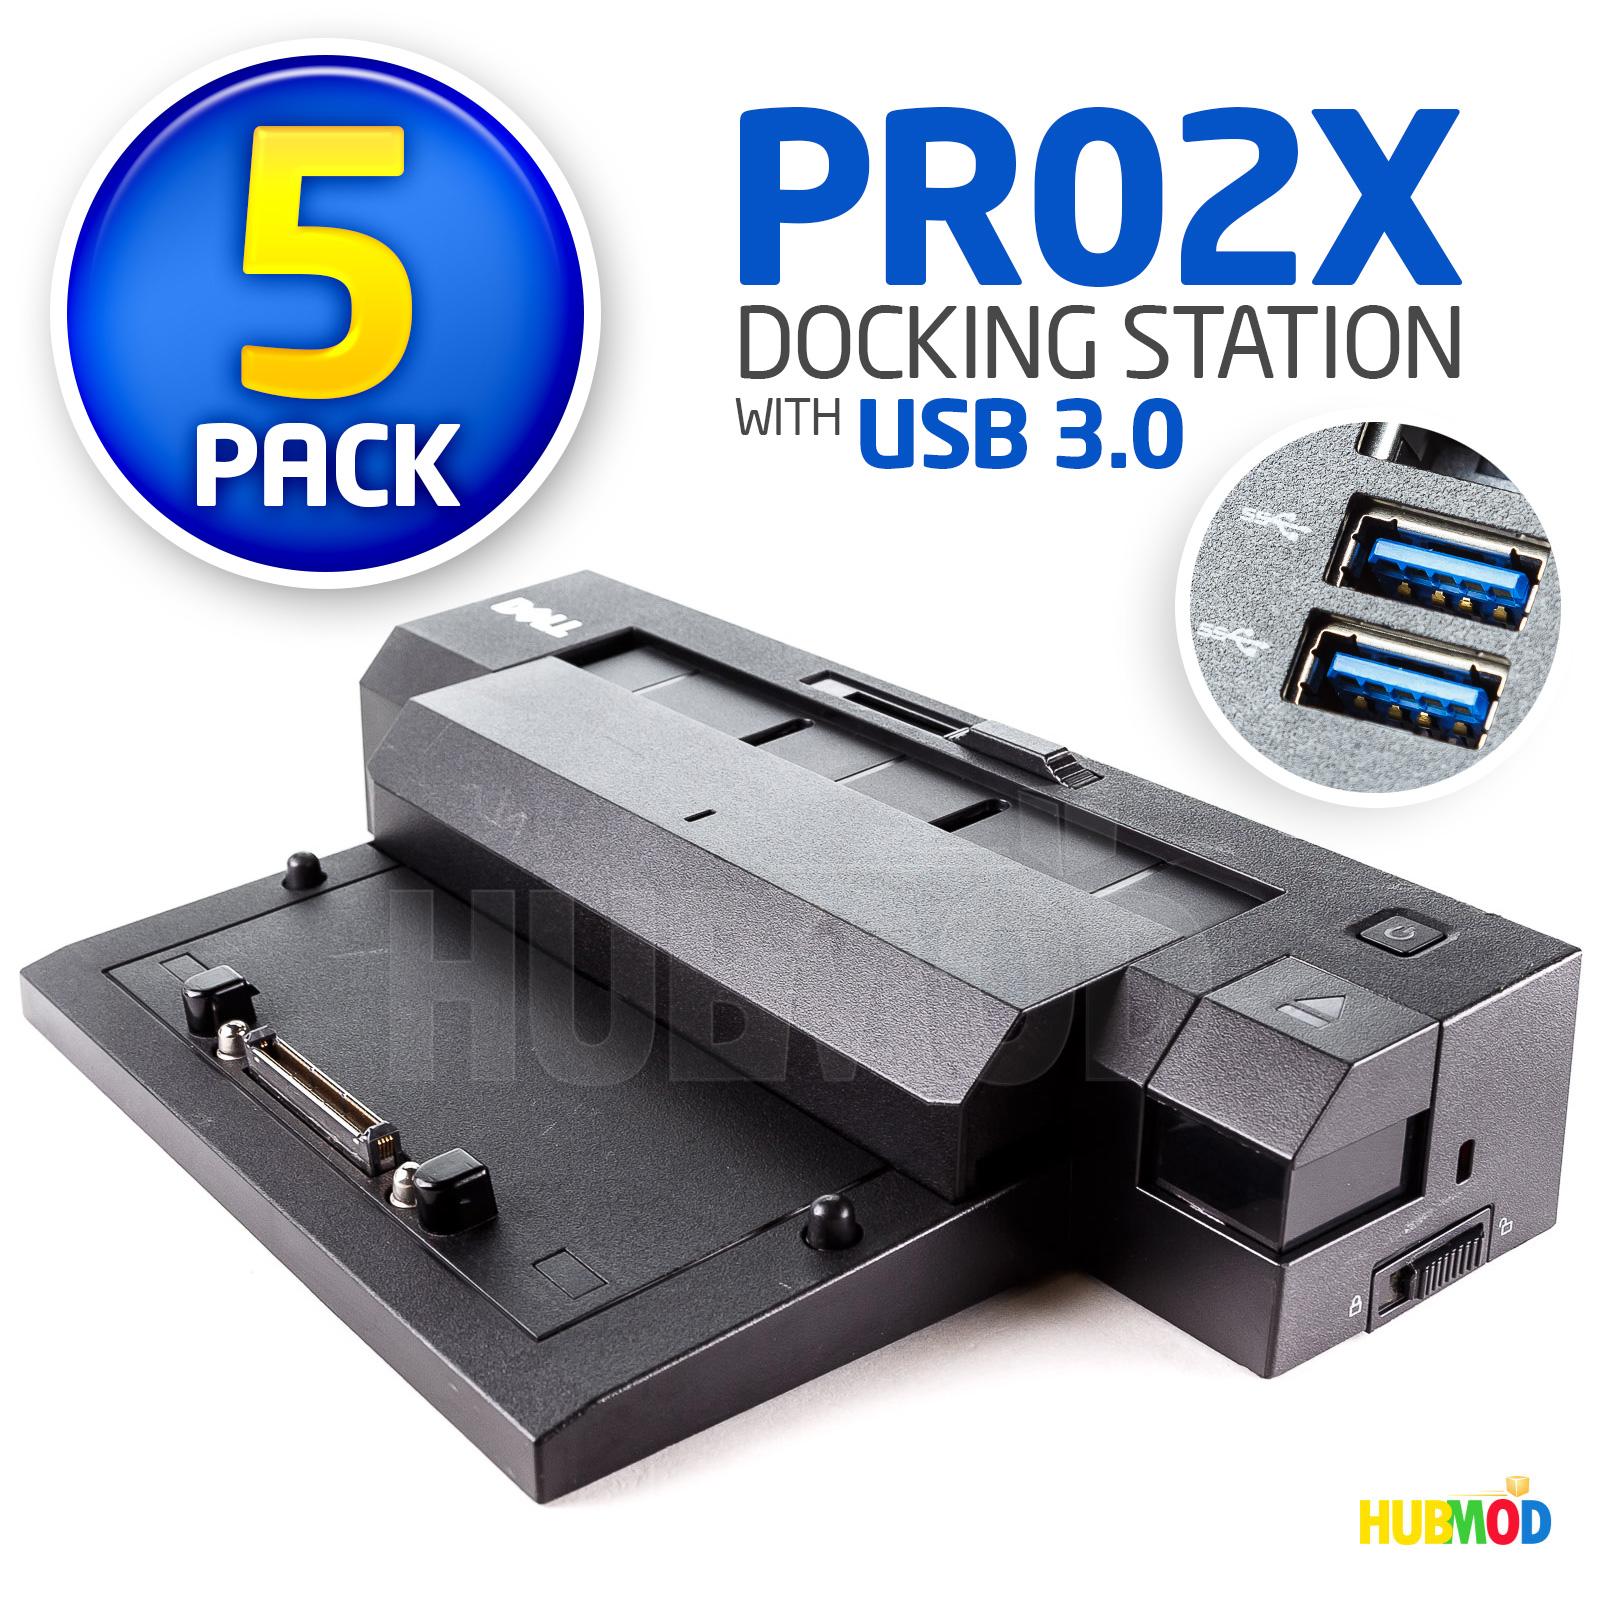 LOT OF 10 DELL E-Port Plus II USB 3.0 Latitude Precision Laptop Docking Station